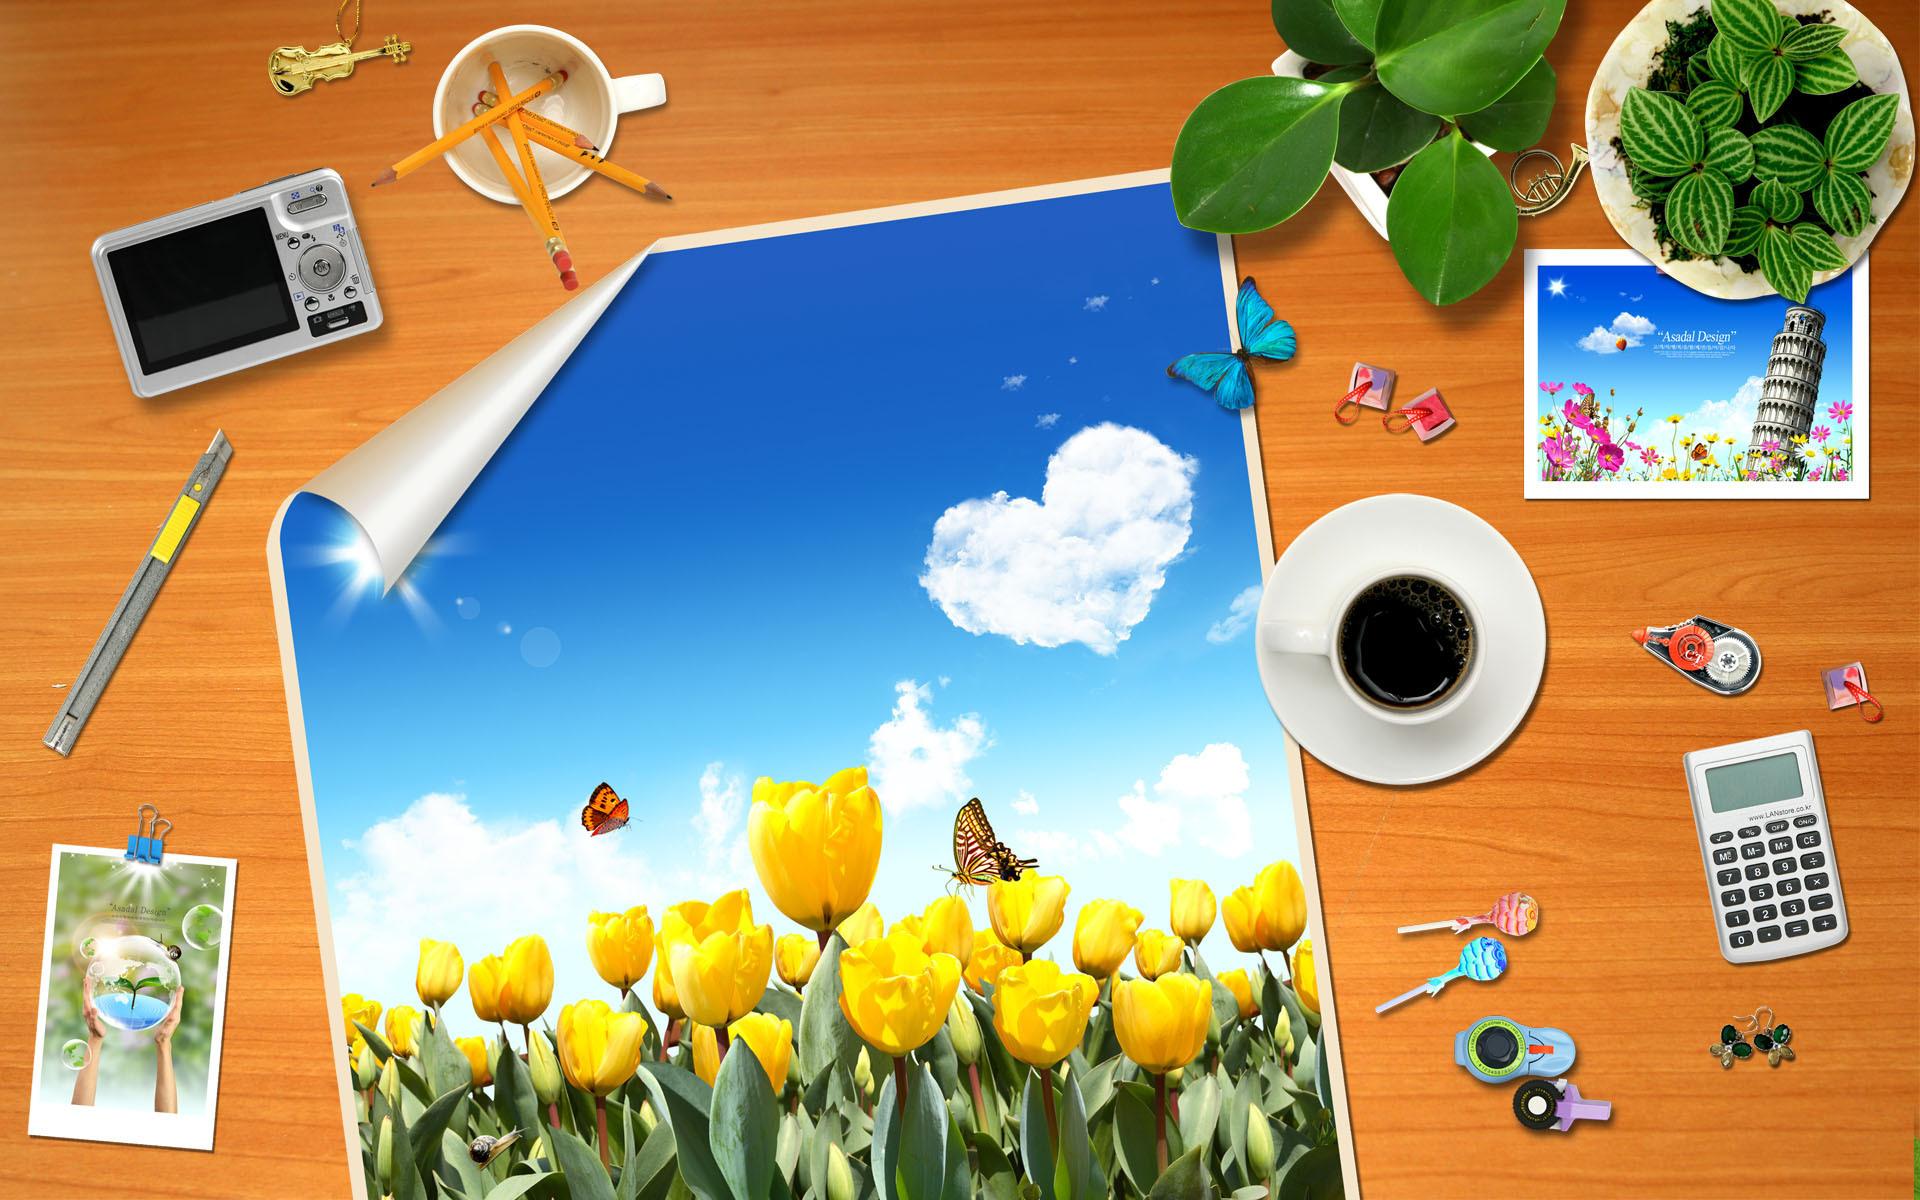 My Cool Art   HD Wallpaper Wallpaper 20673200 1920x1200